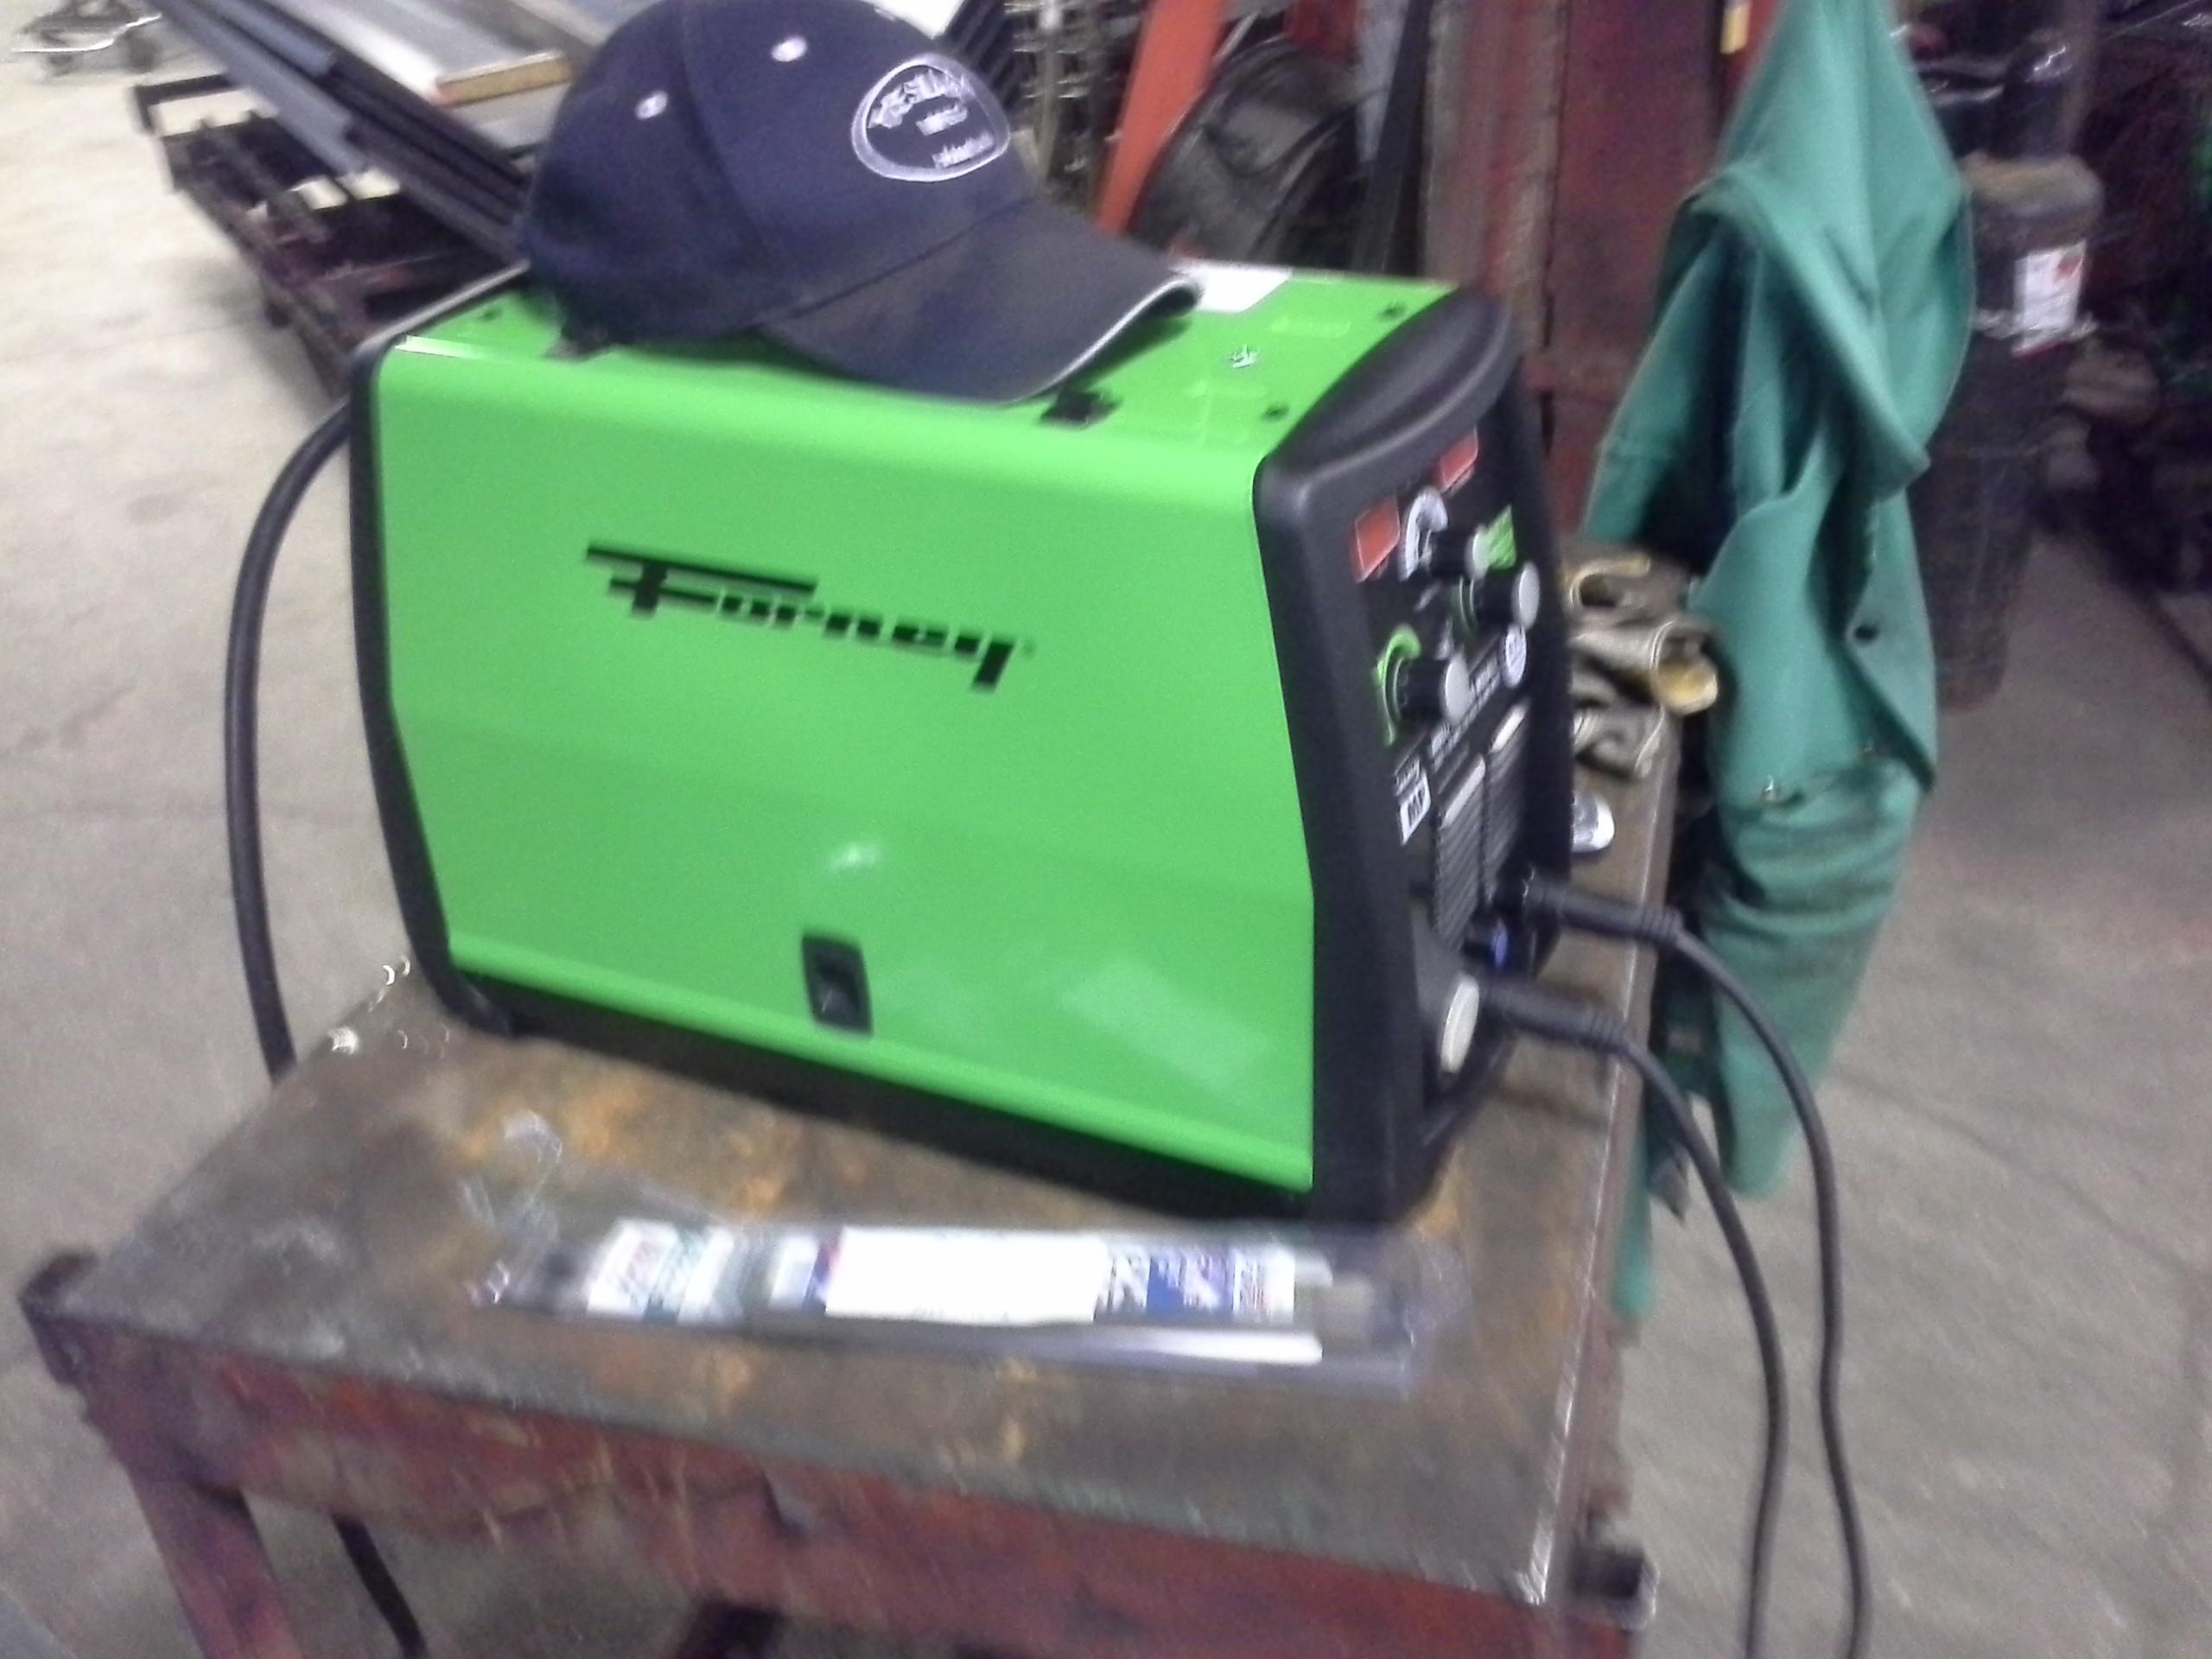 Forney 190 Mp Welder Te Slaa Manufacturing